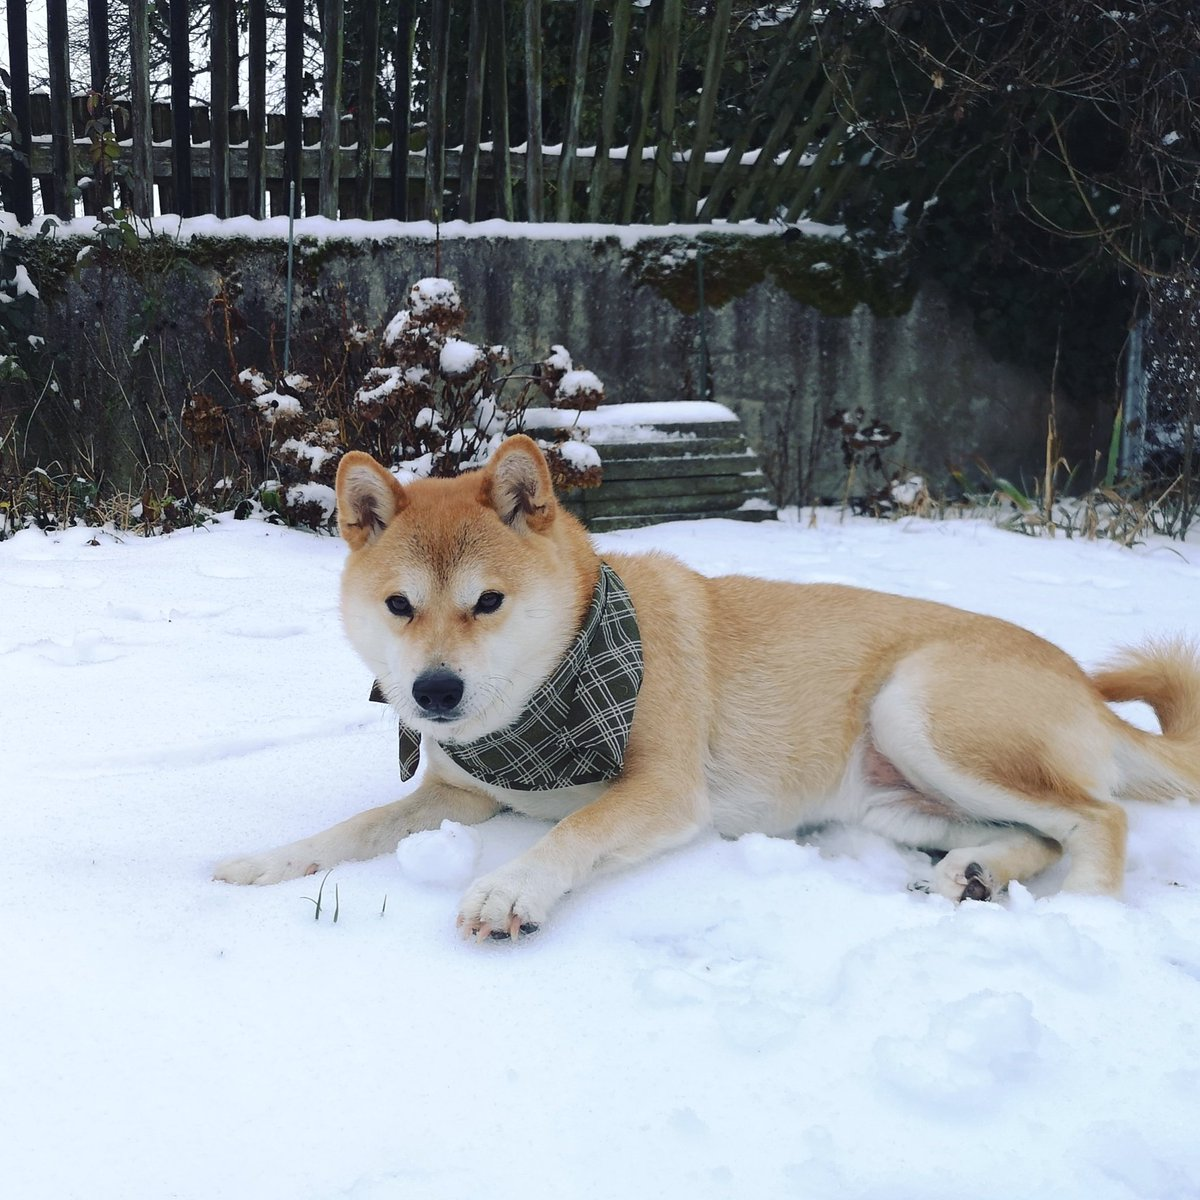 Snow in my yard #shibainu #winter #shibs<br>http://pic.twitter.com/LO0pawH0SN